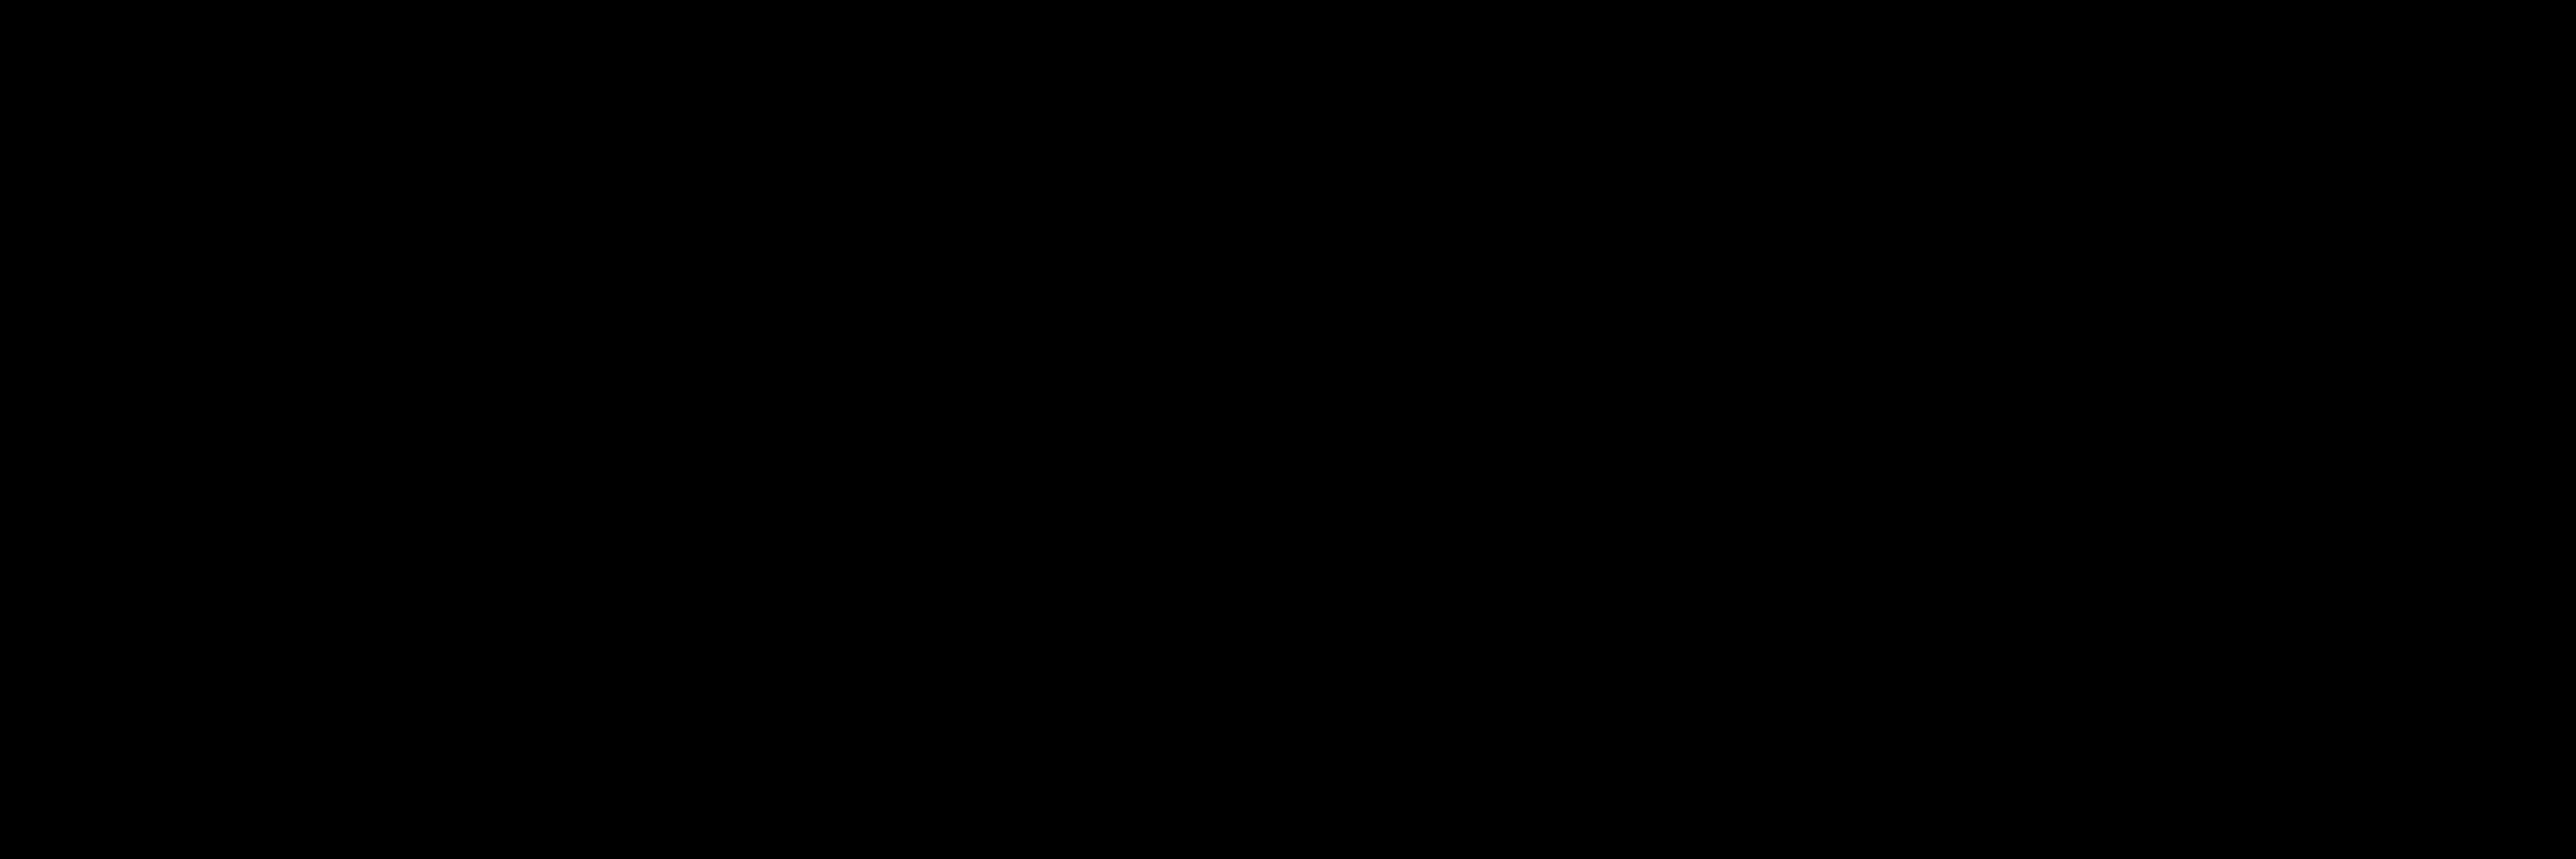 R&P black logo